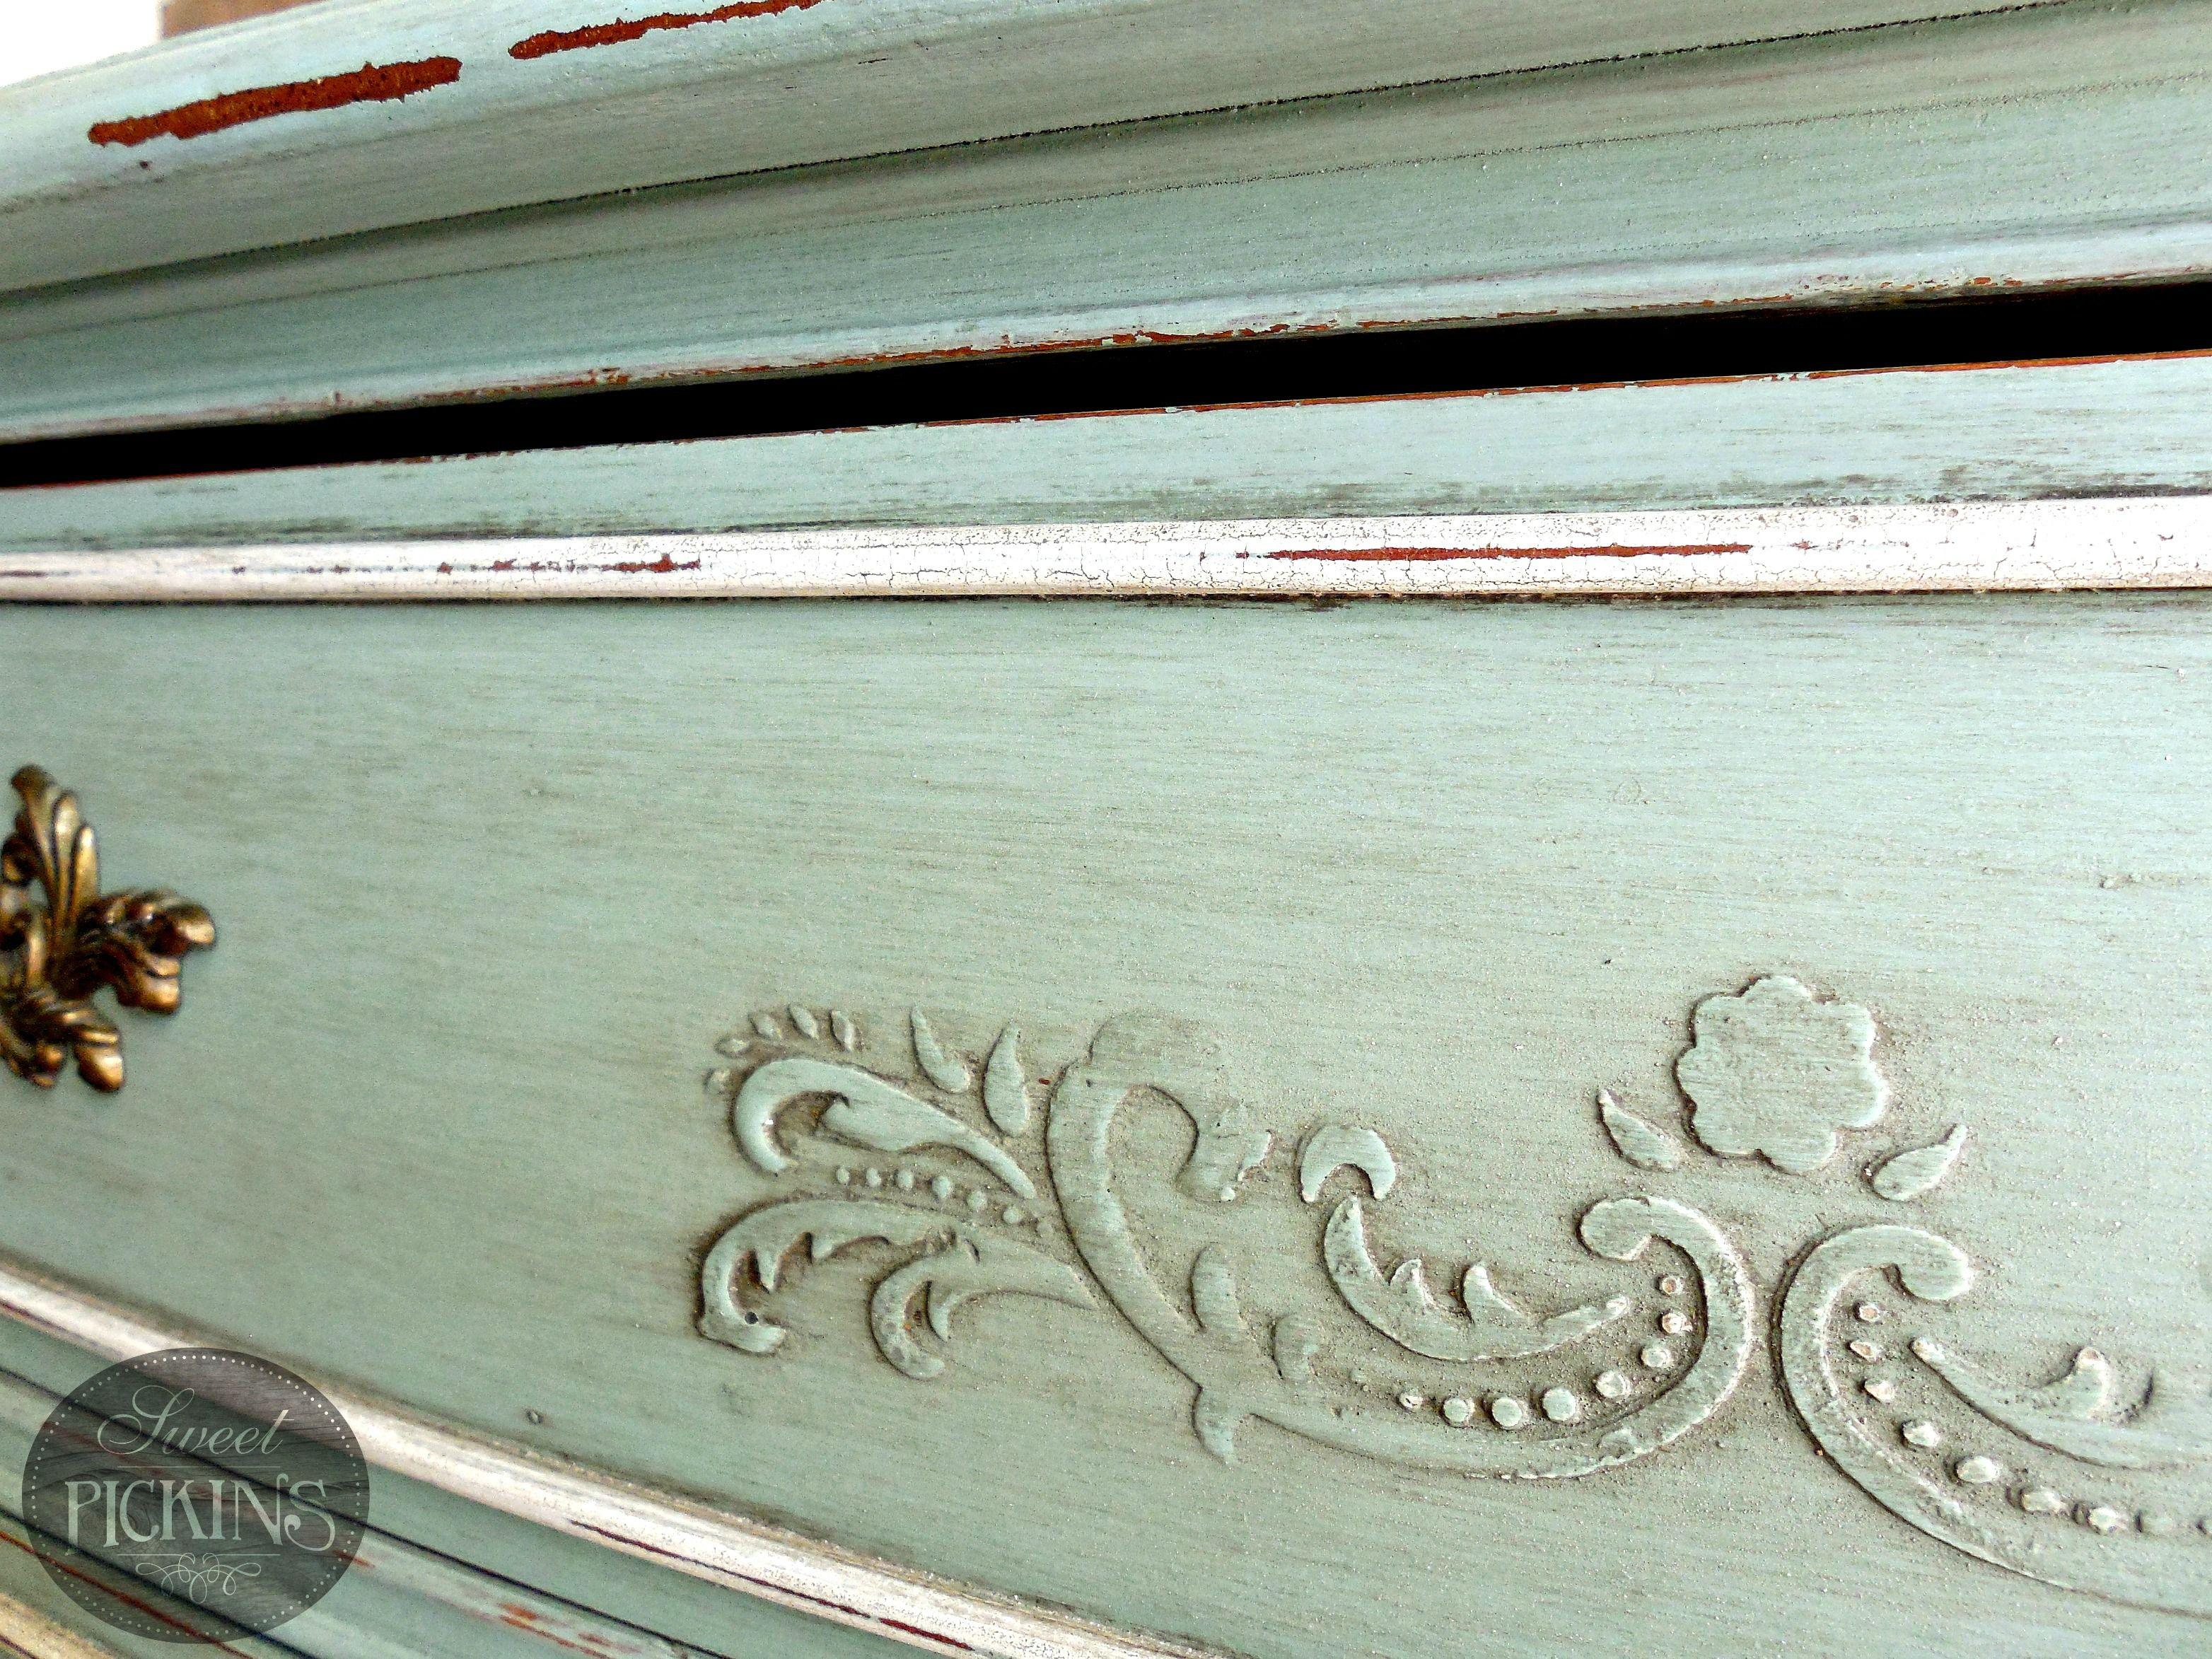 Sweet Pickins Raised Stencil Tutorial. Kids Painted FurnitureStenciling ...